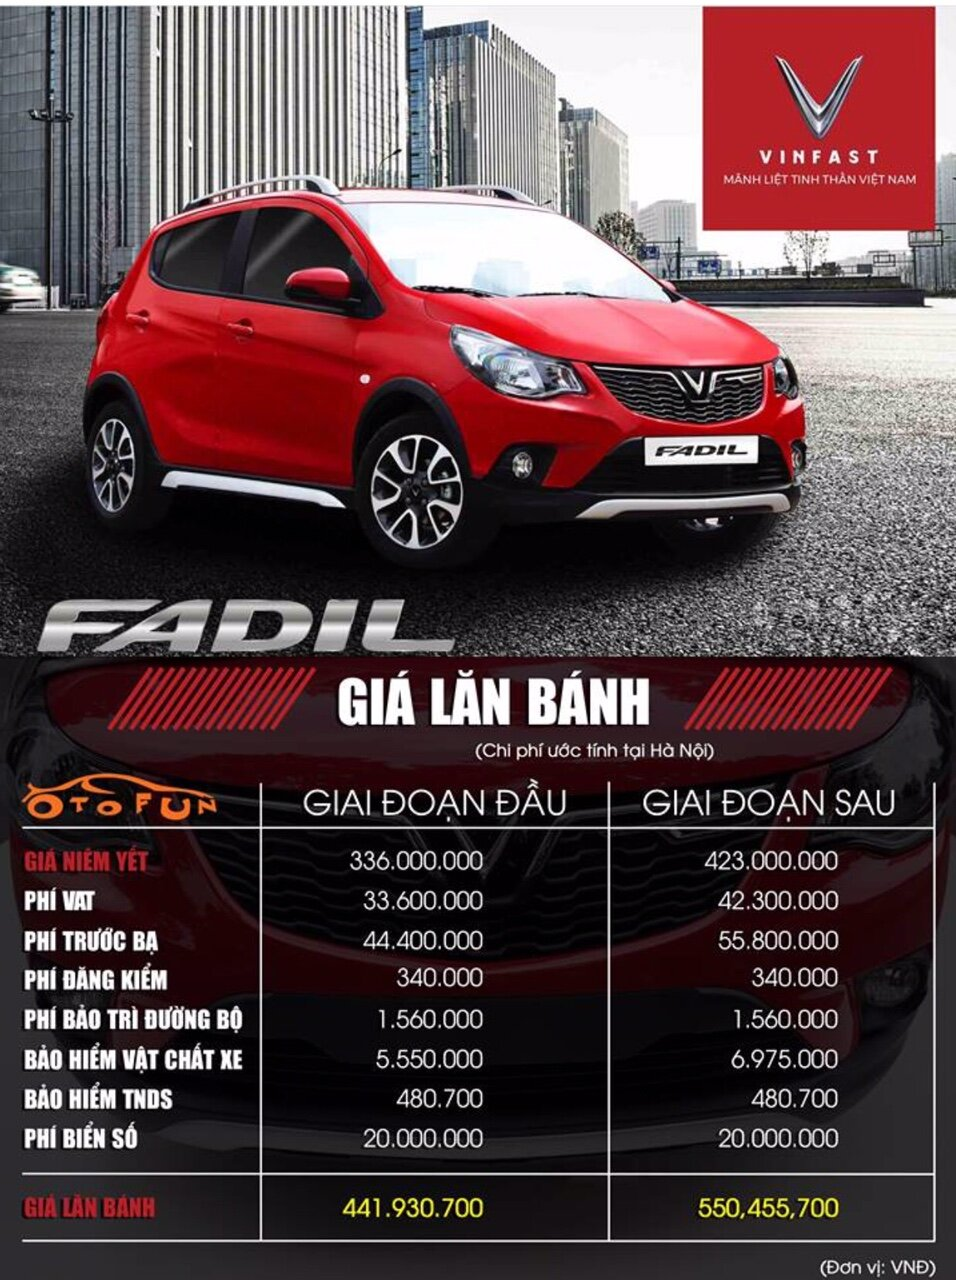 Bảng giá xe Fadil